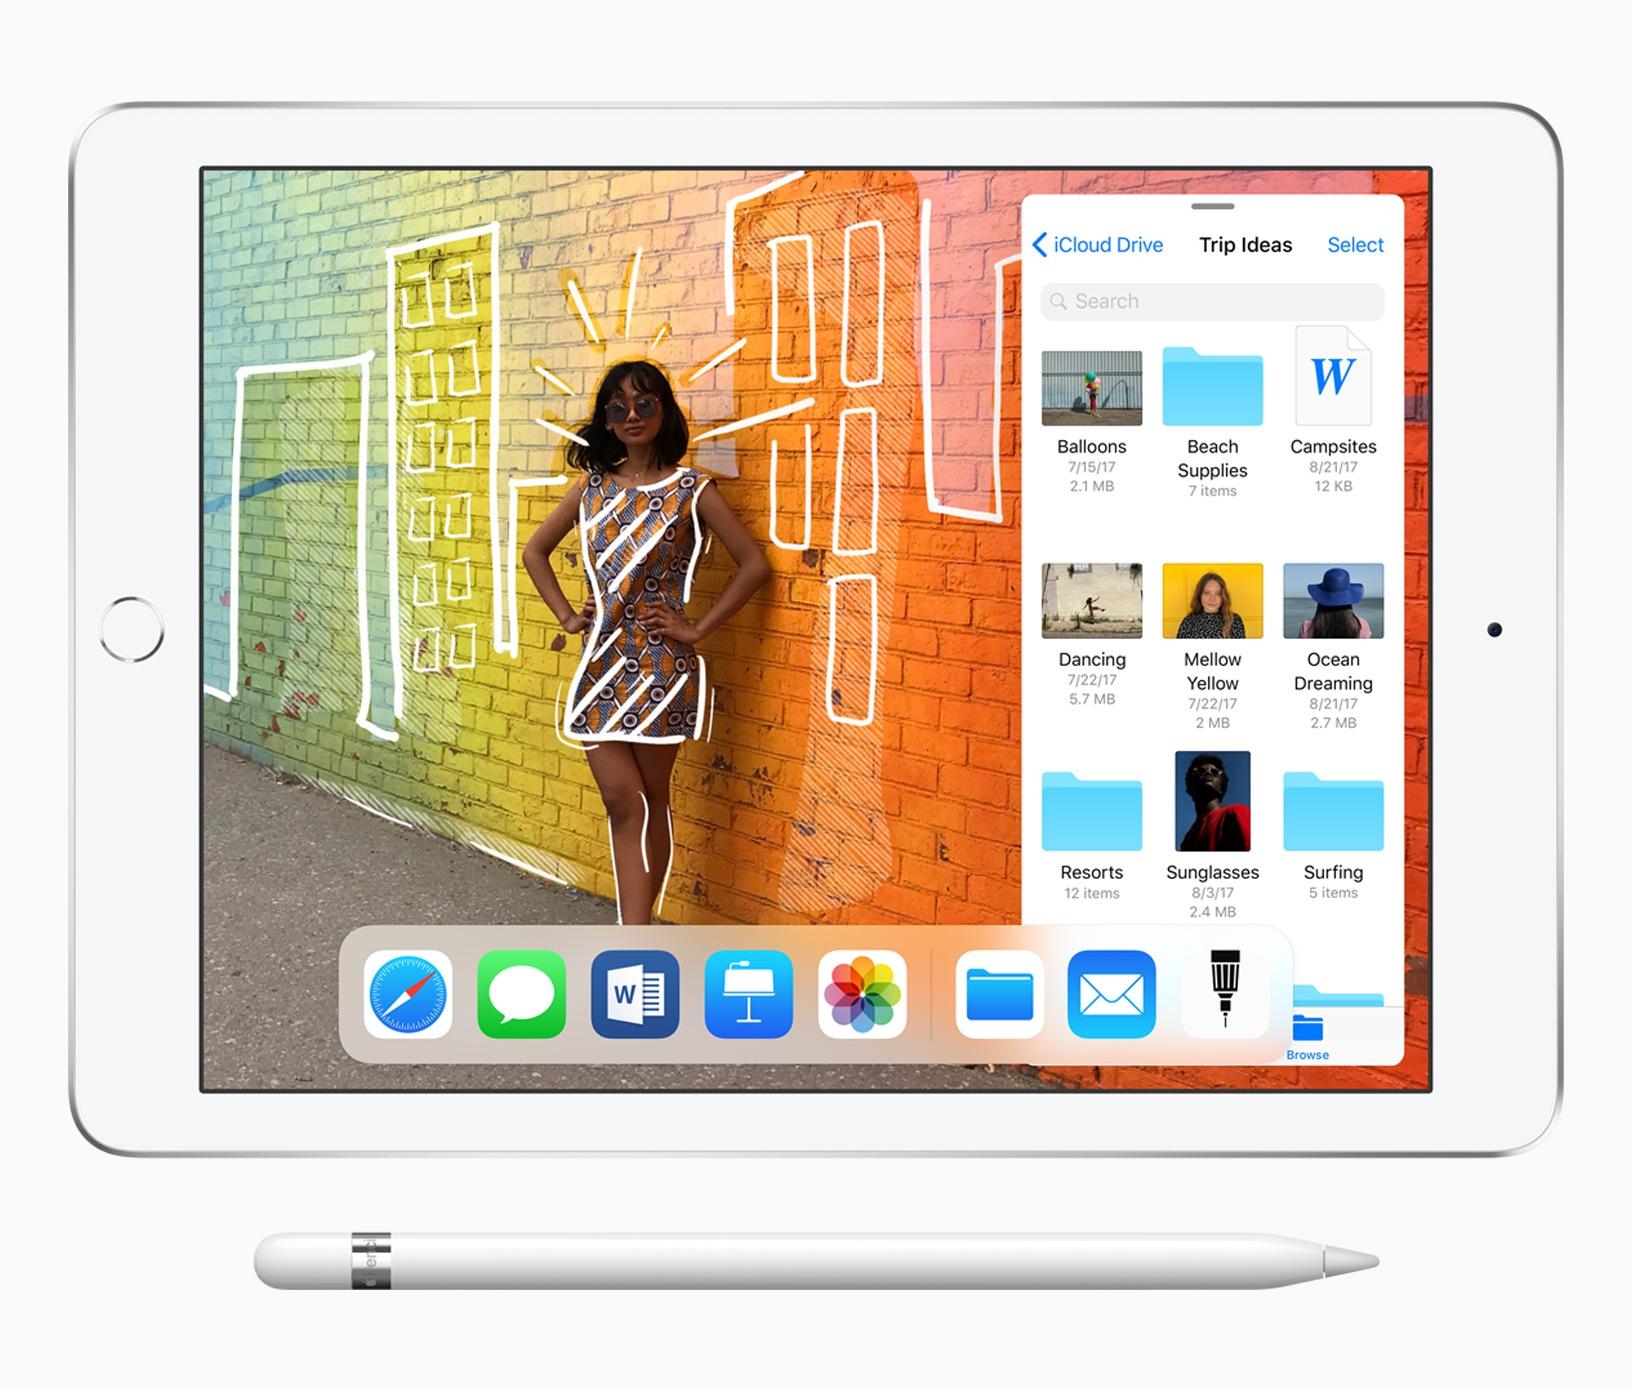 iPad-9-7-inch-Pencil_Slider_32718